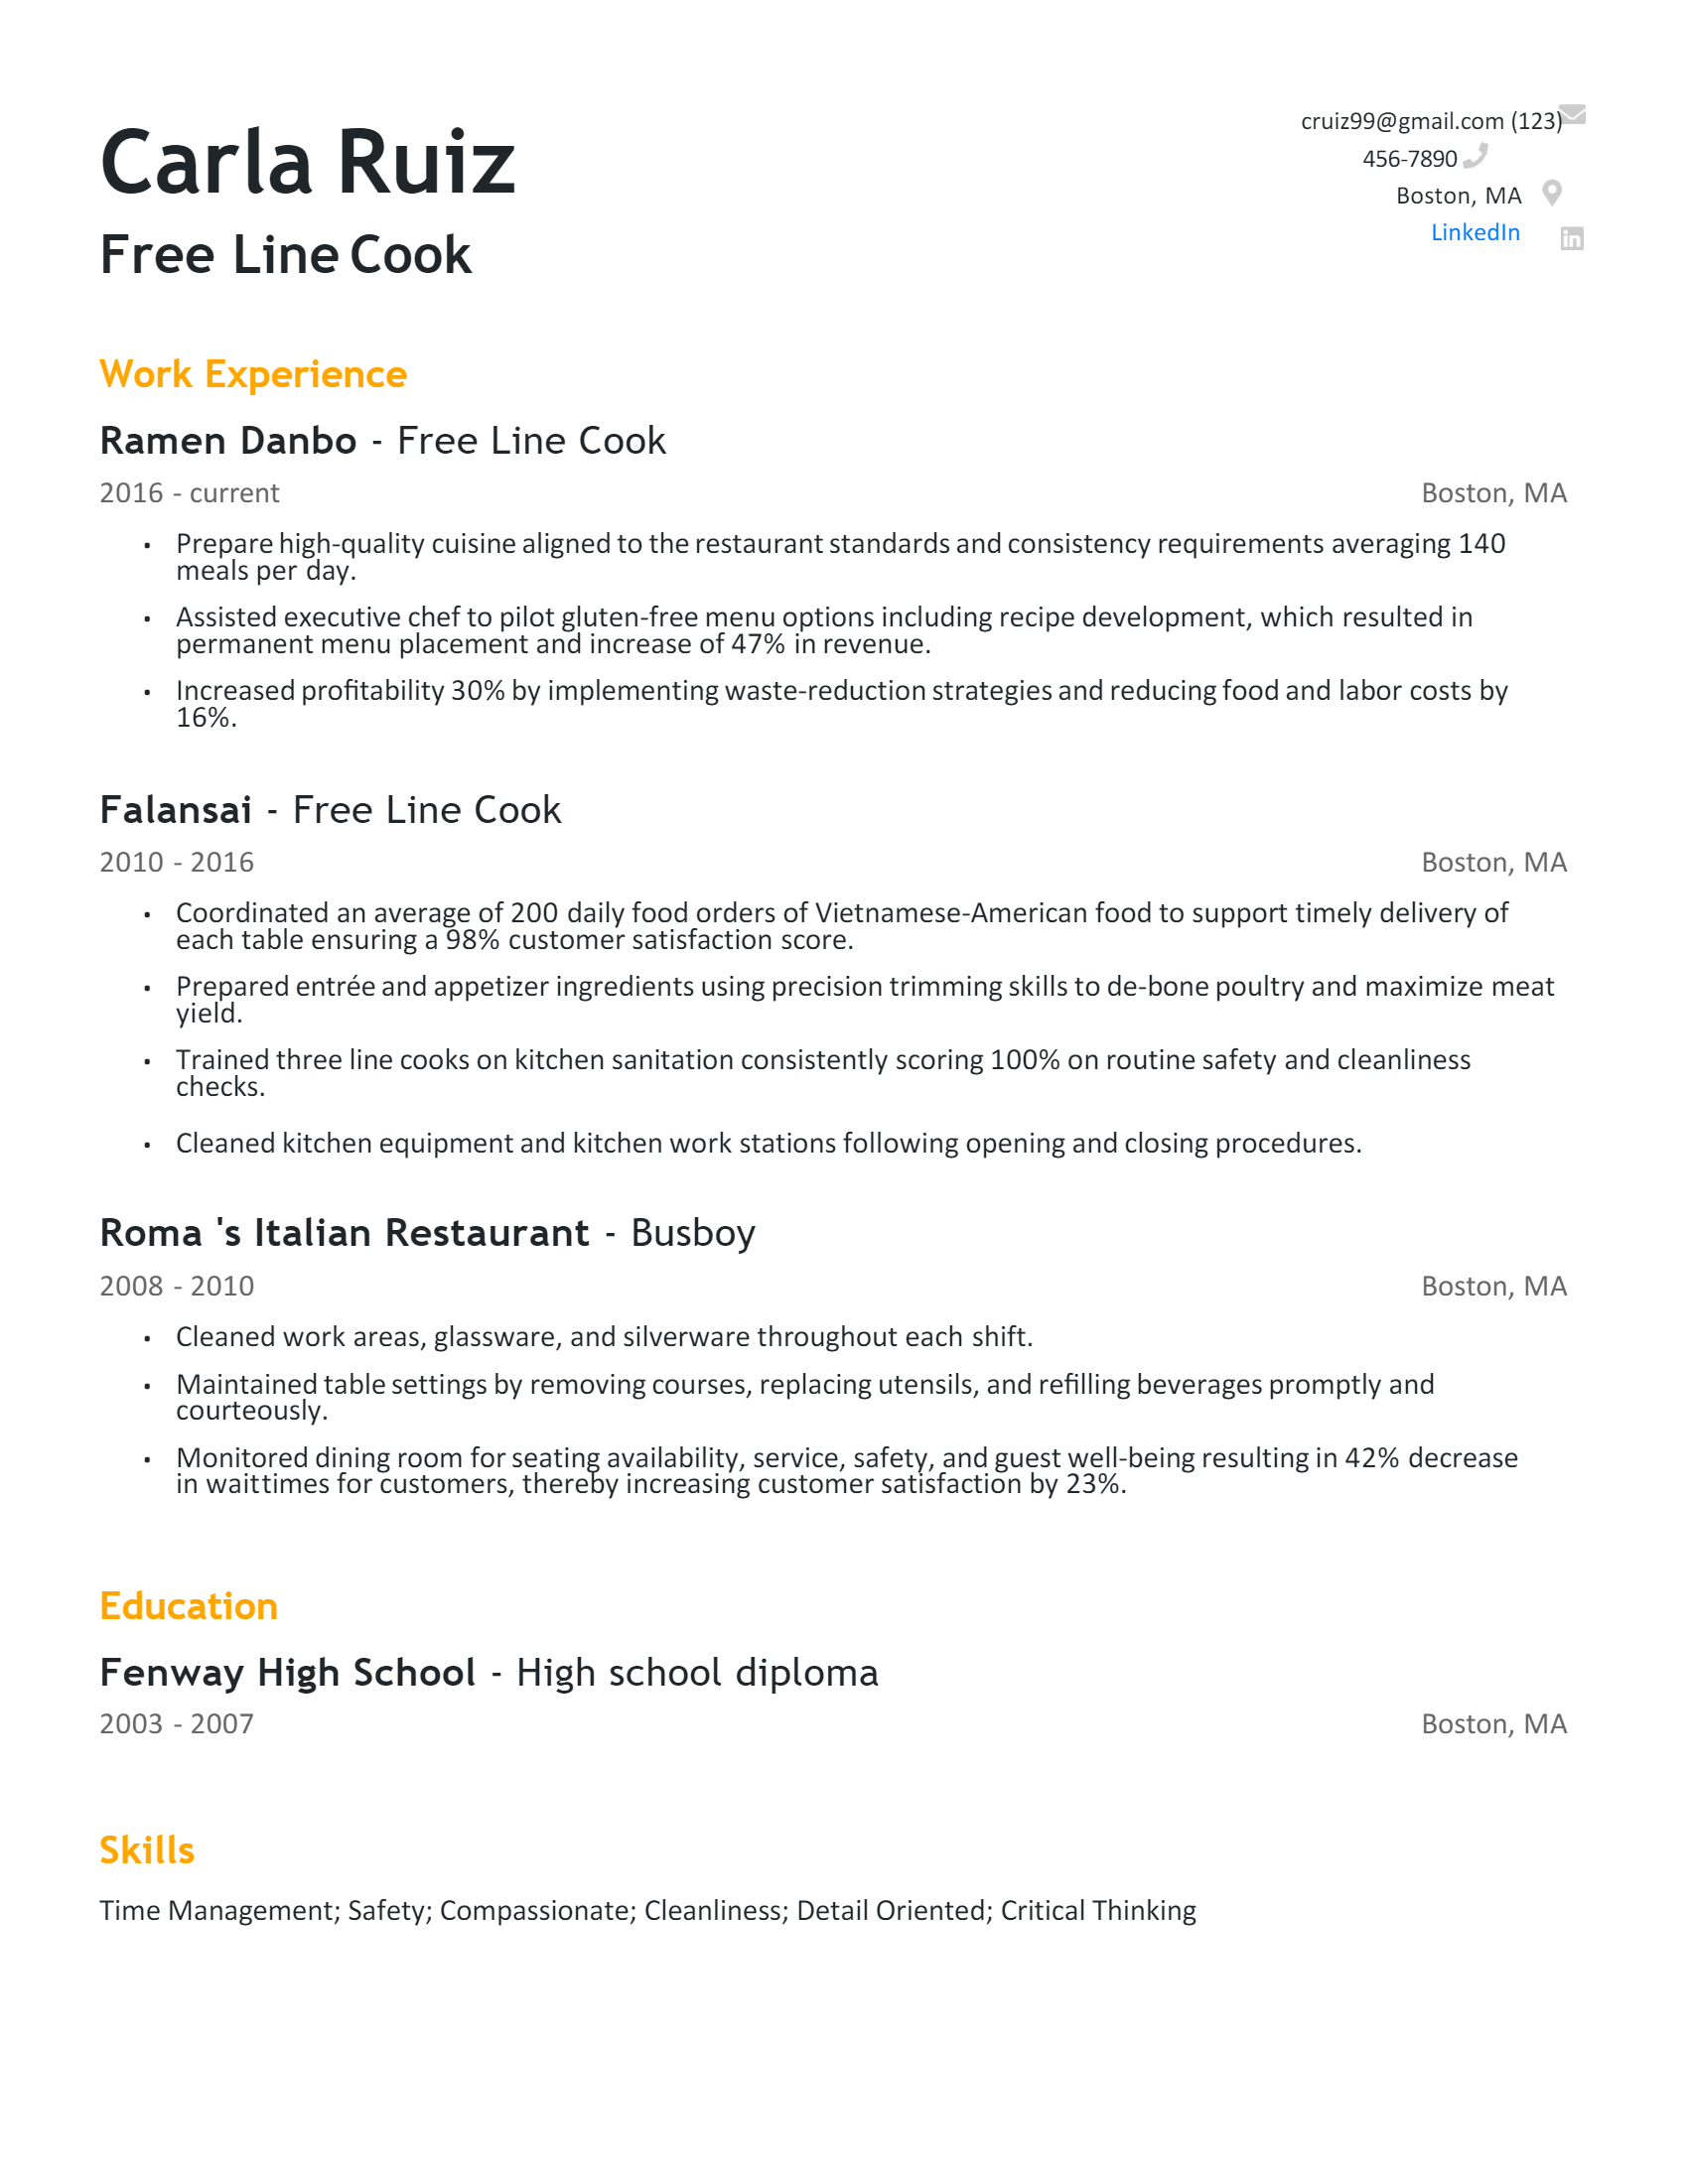 Free Line Cook Resume .Docx (Word)